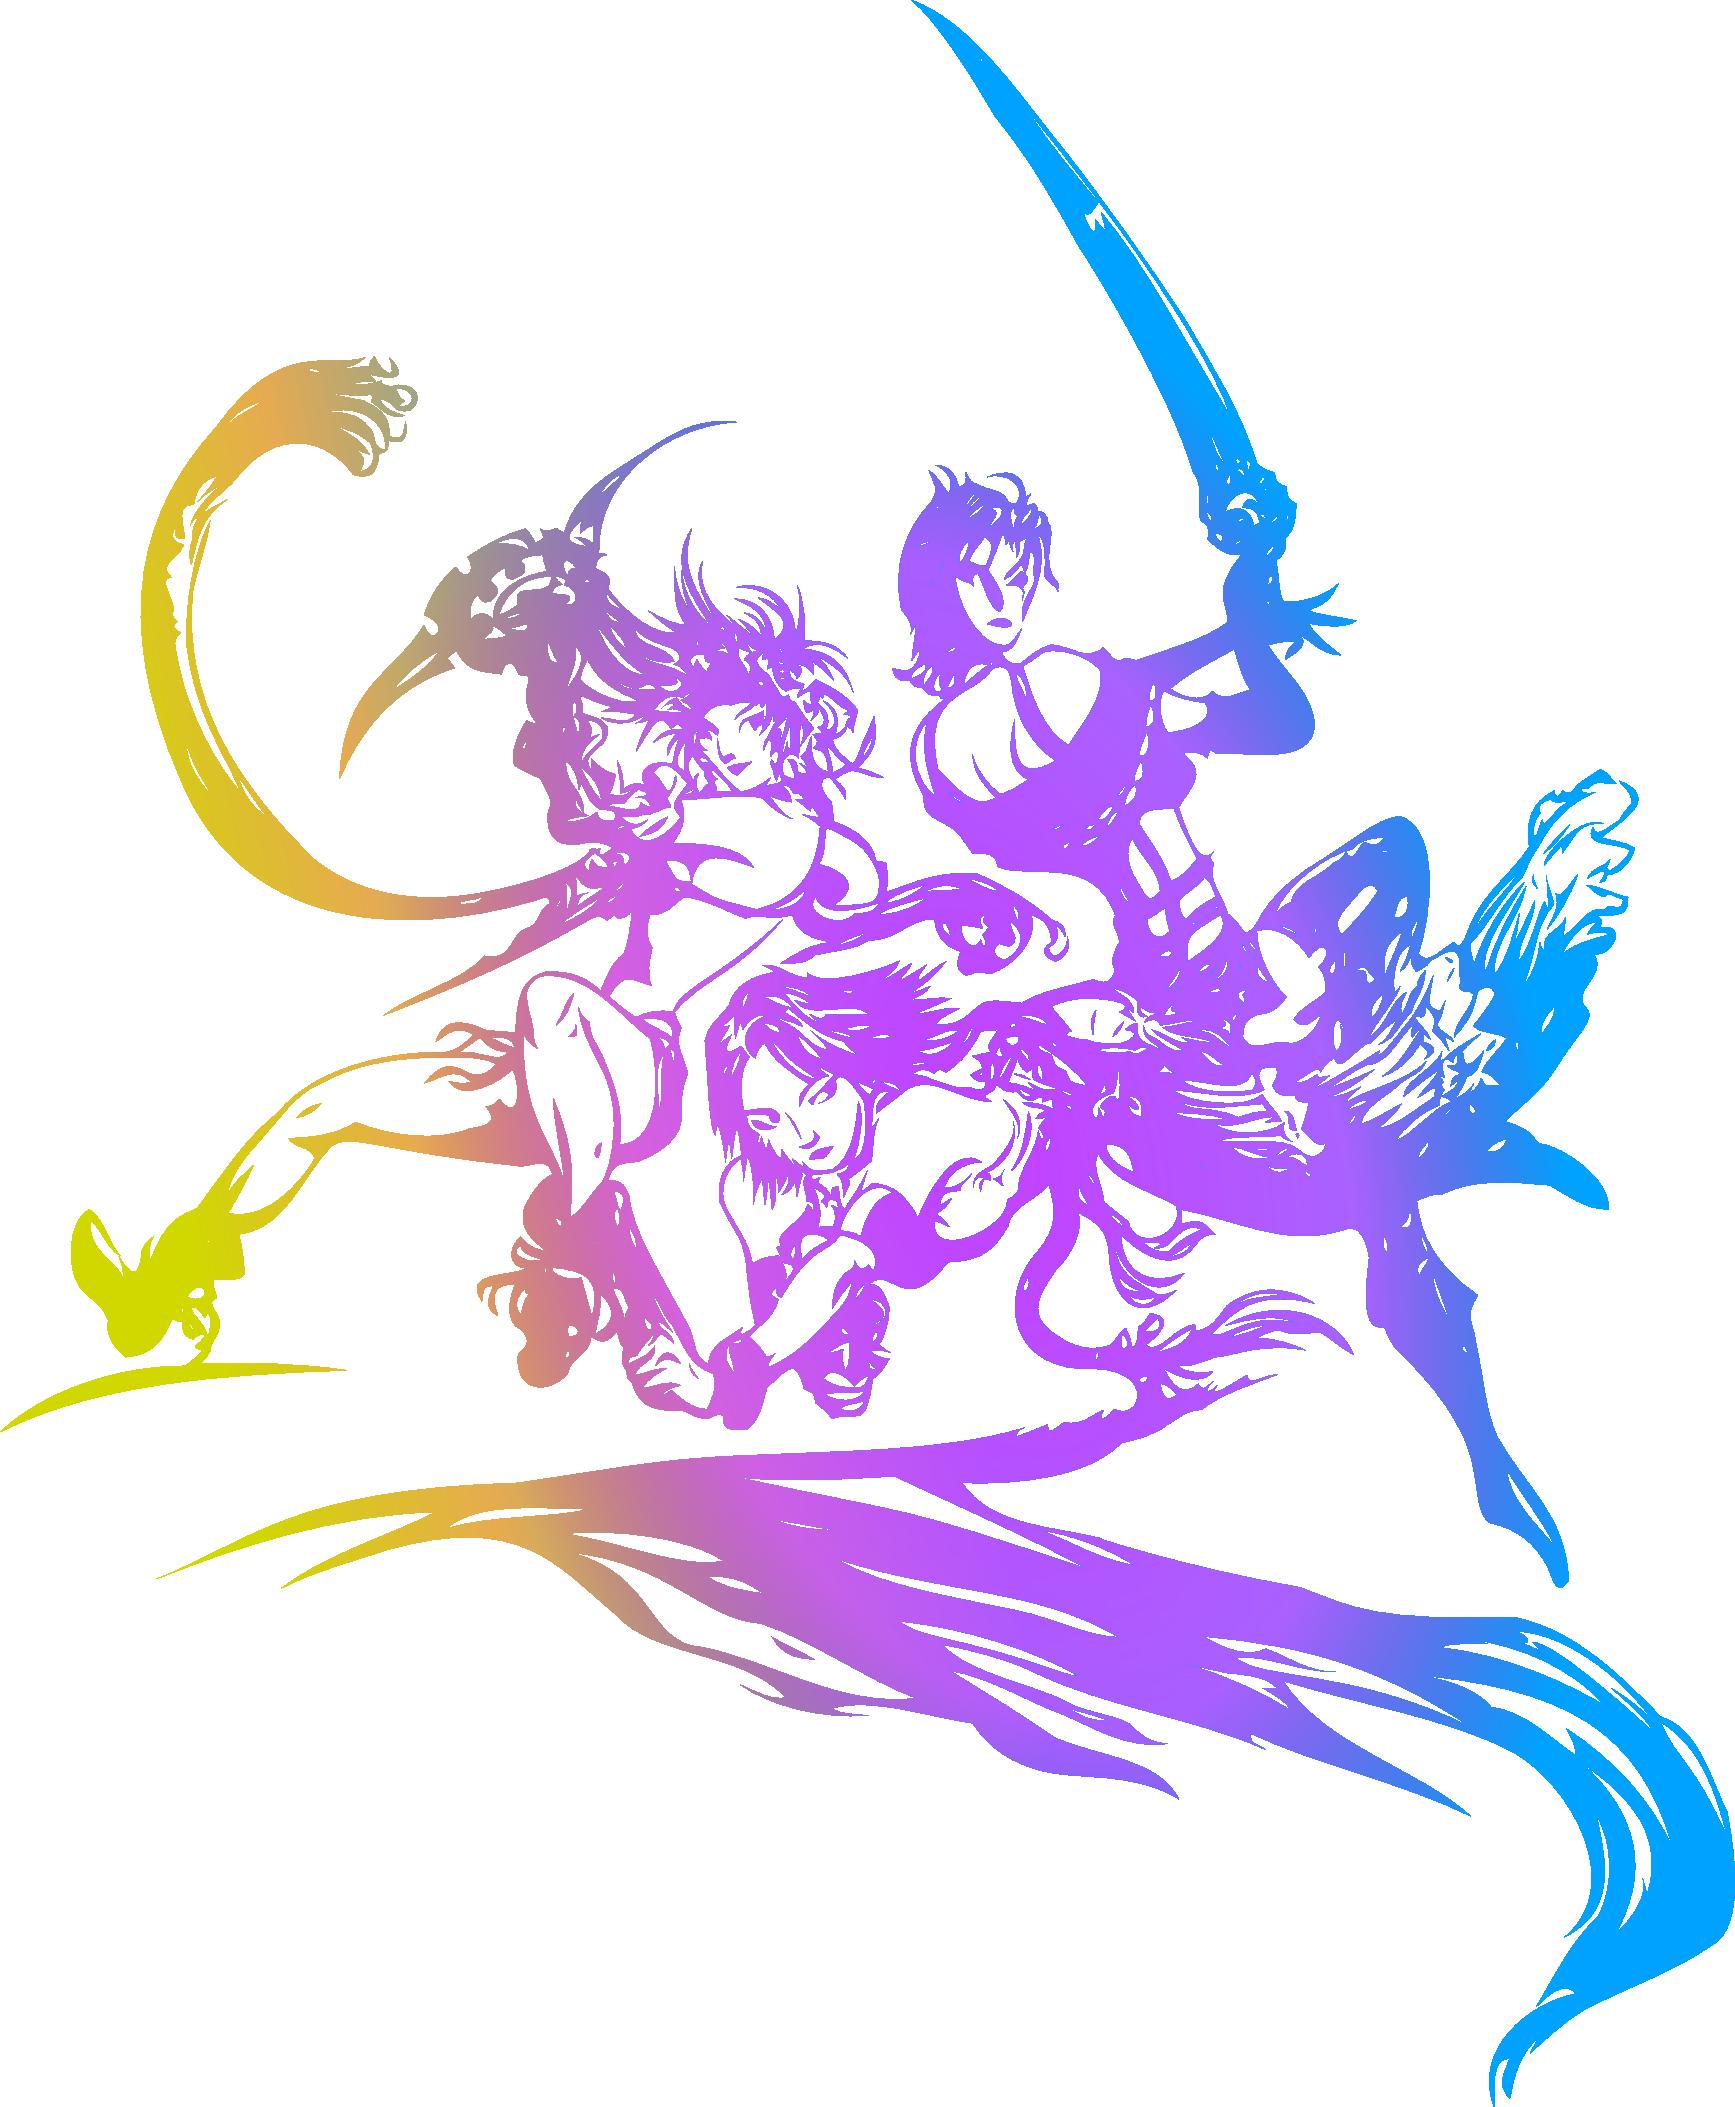 Final Fantasy X 2 Vector Logo By Eldi13 D48cl39 Png 1735 2107 Final Fantasy Logo Final Fantasy Tattoo Final Fantasy Artwork